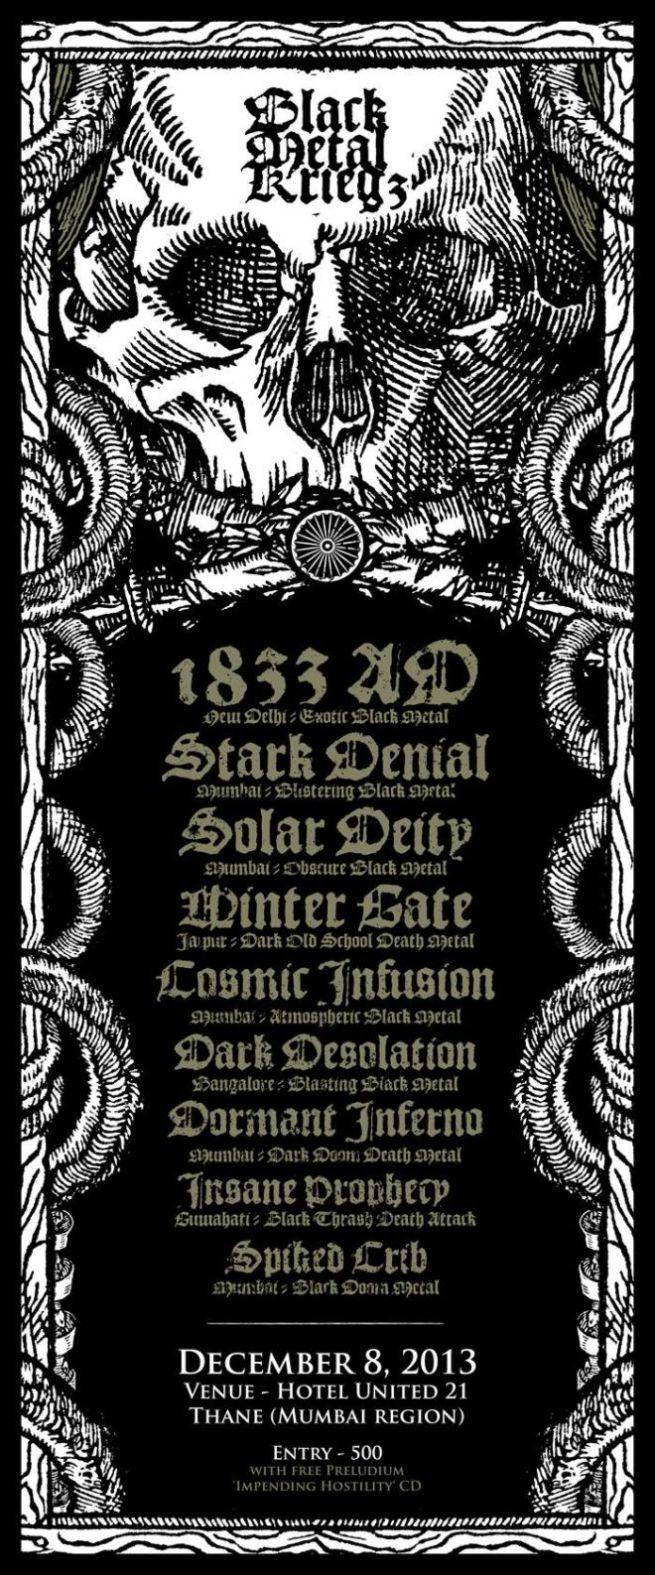 black-metal-krieg-3-gig-poster